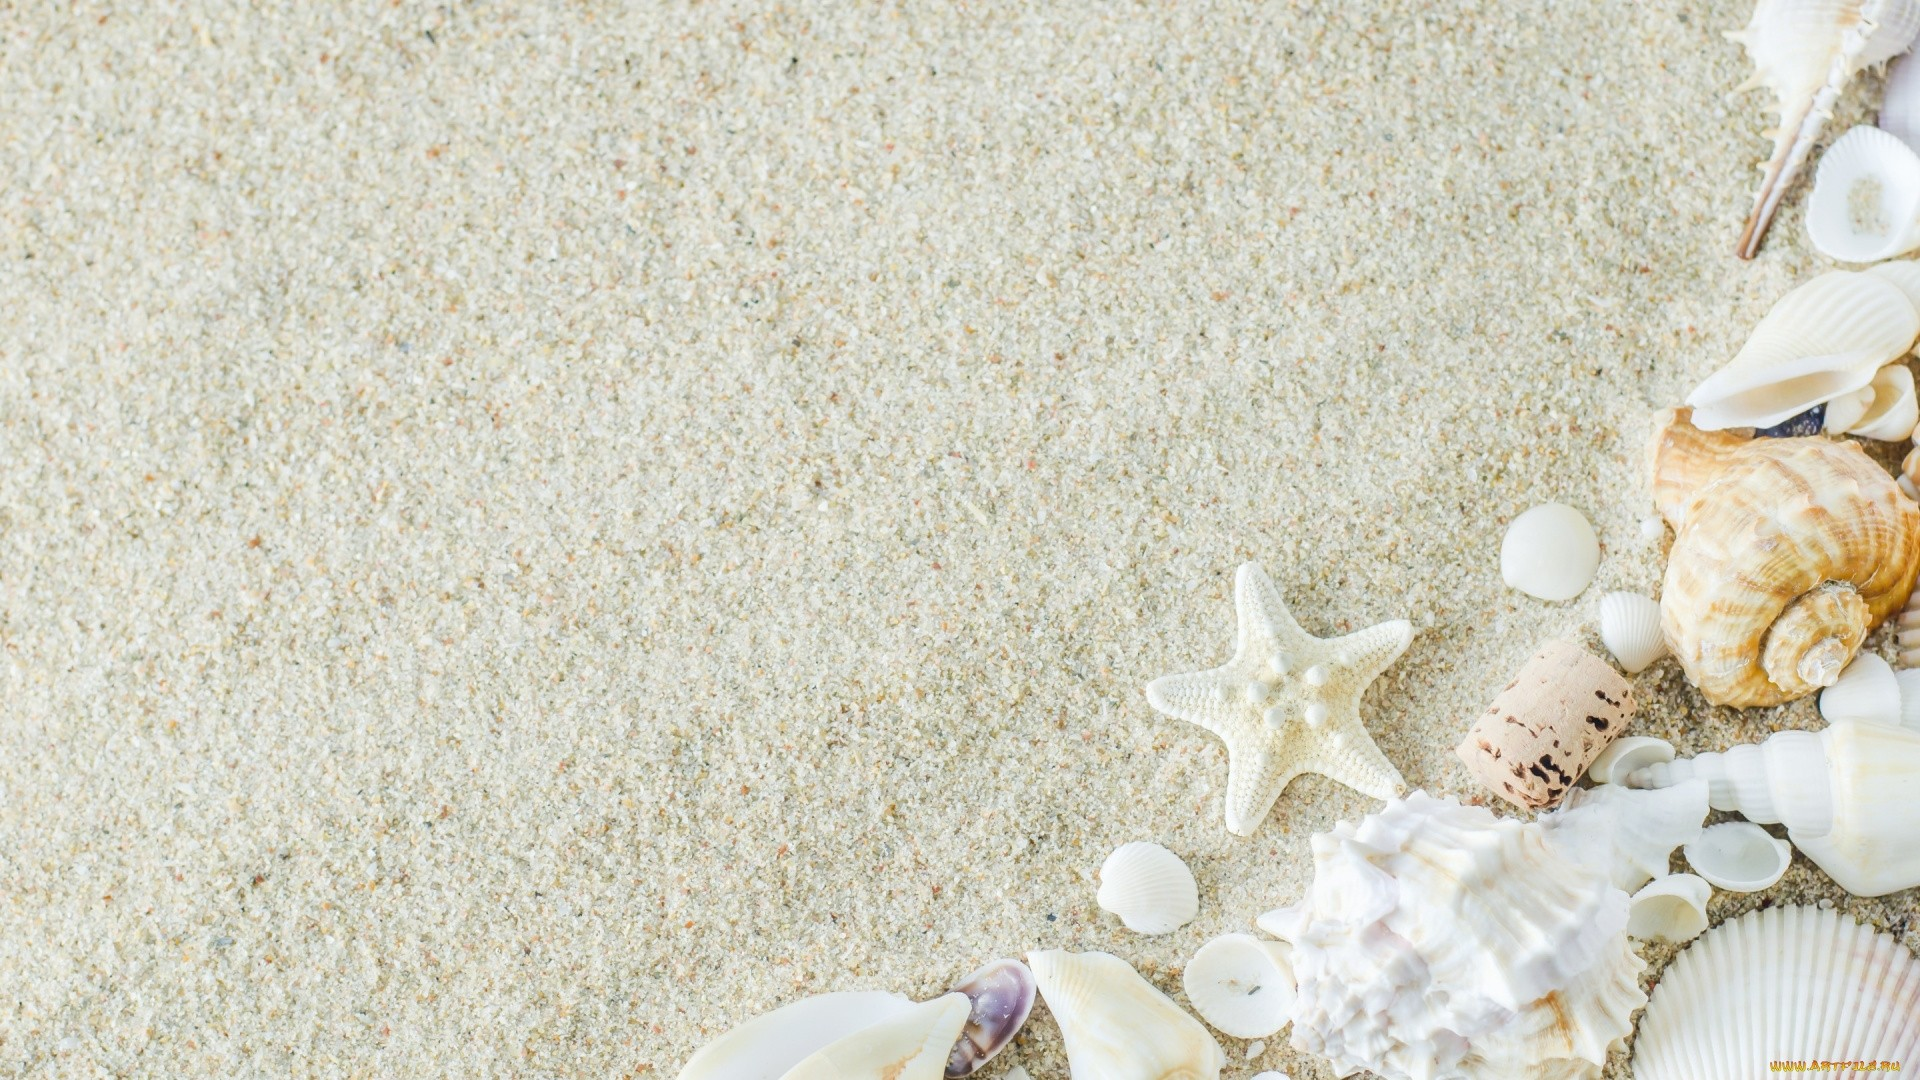 Seashell wallpaper photo hd